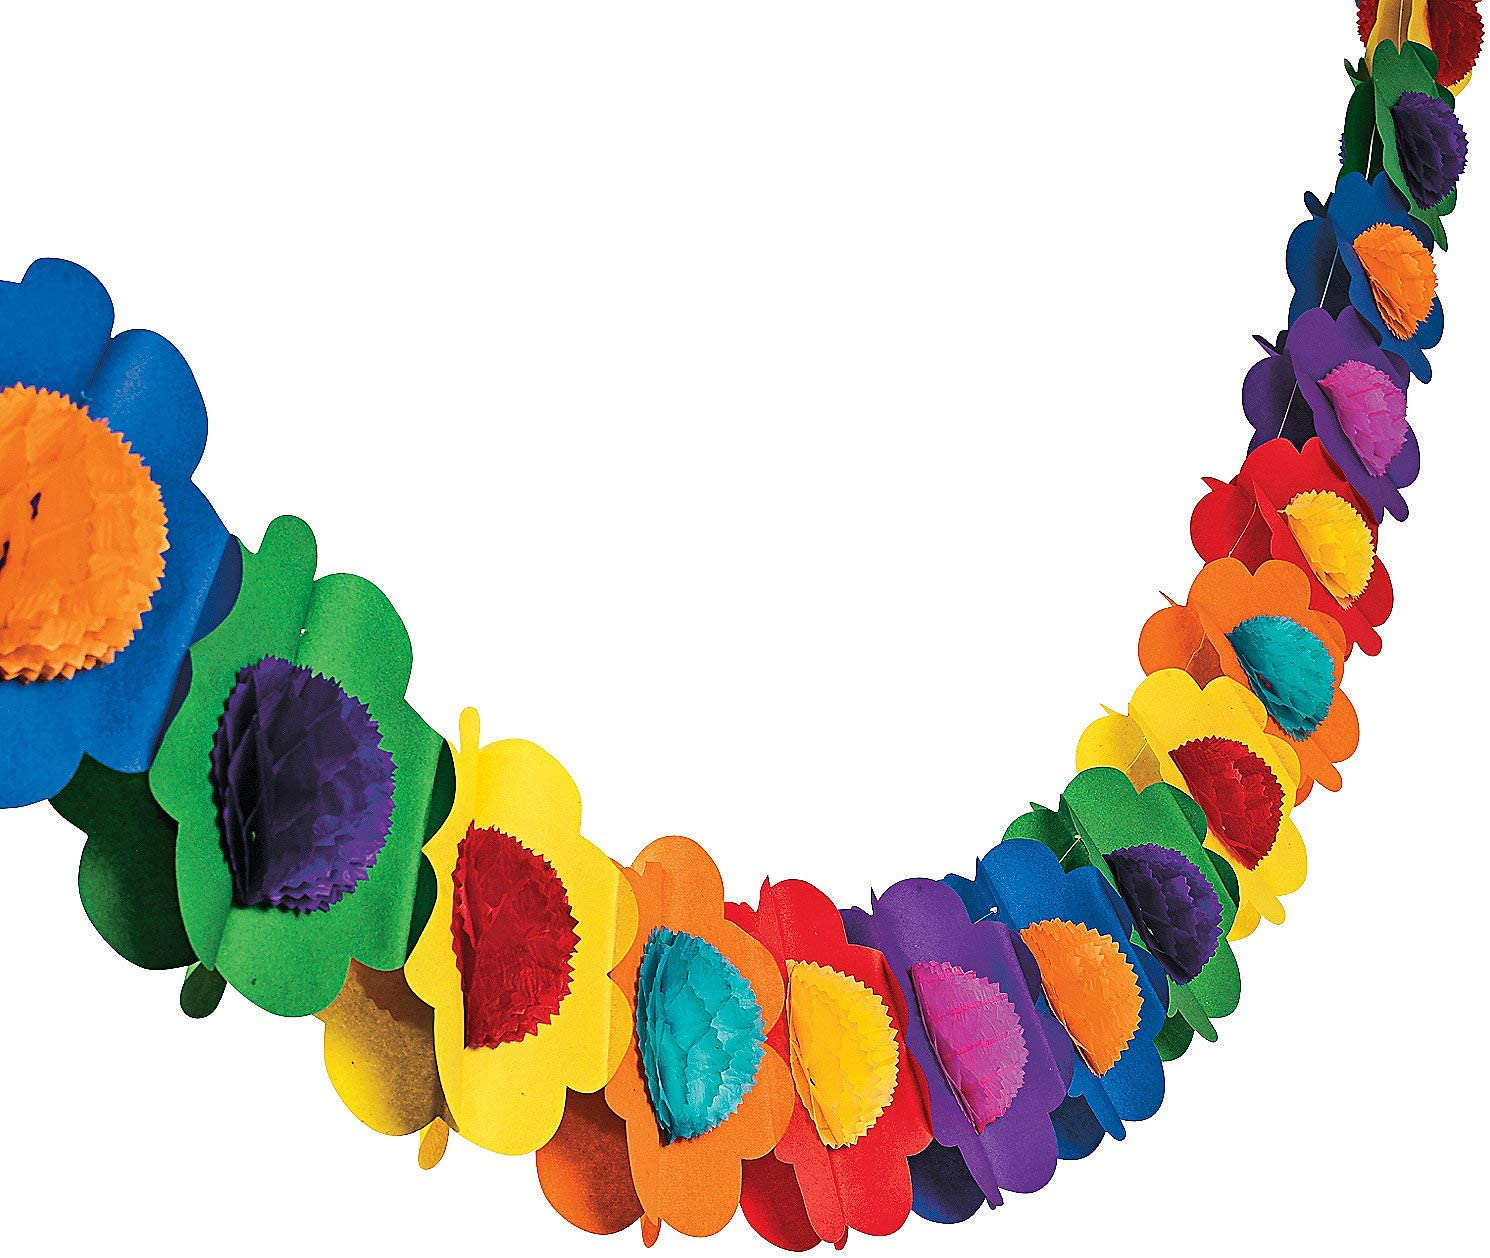 Fun Express - Multicolor Tissue Flower Garland for Party - Party Decor - Hanging Decor - Garland - Party - 1 Piece